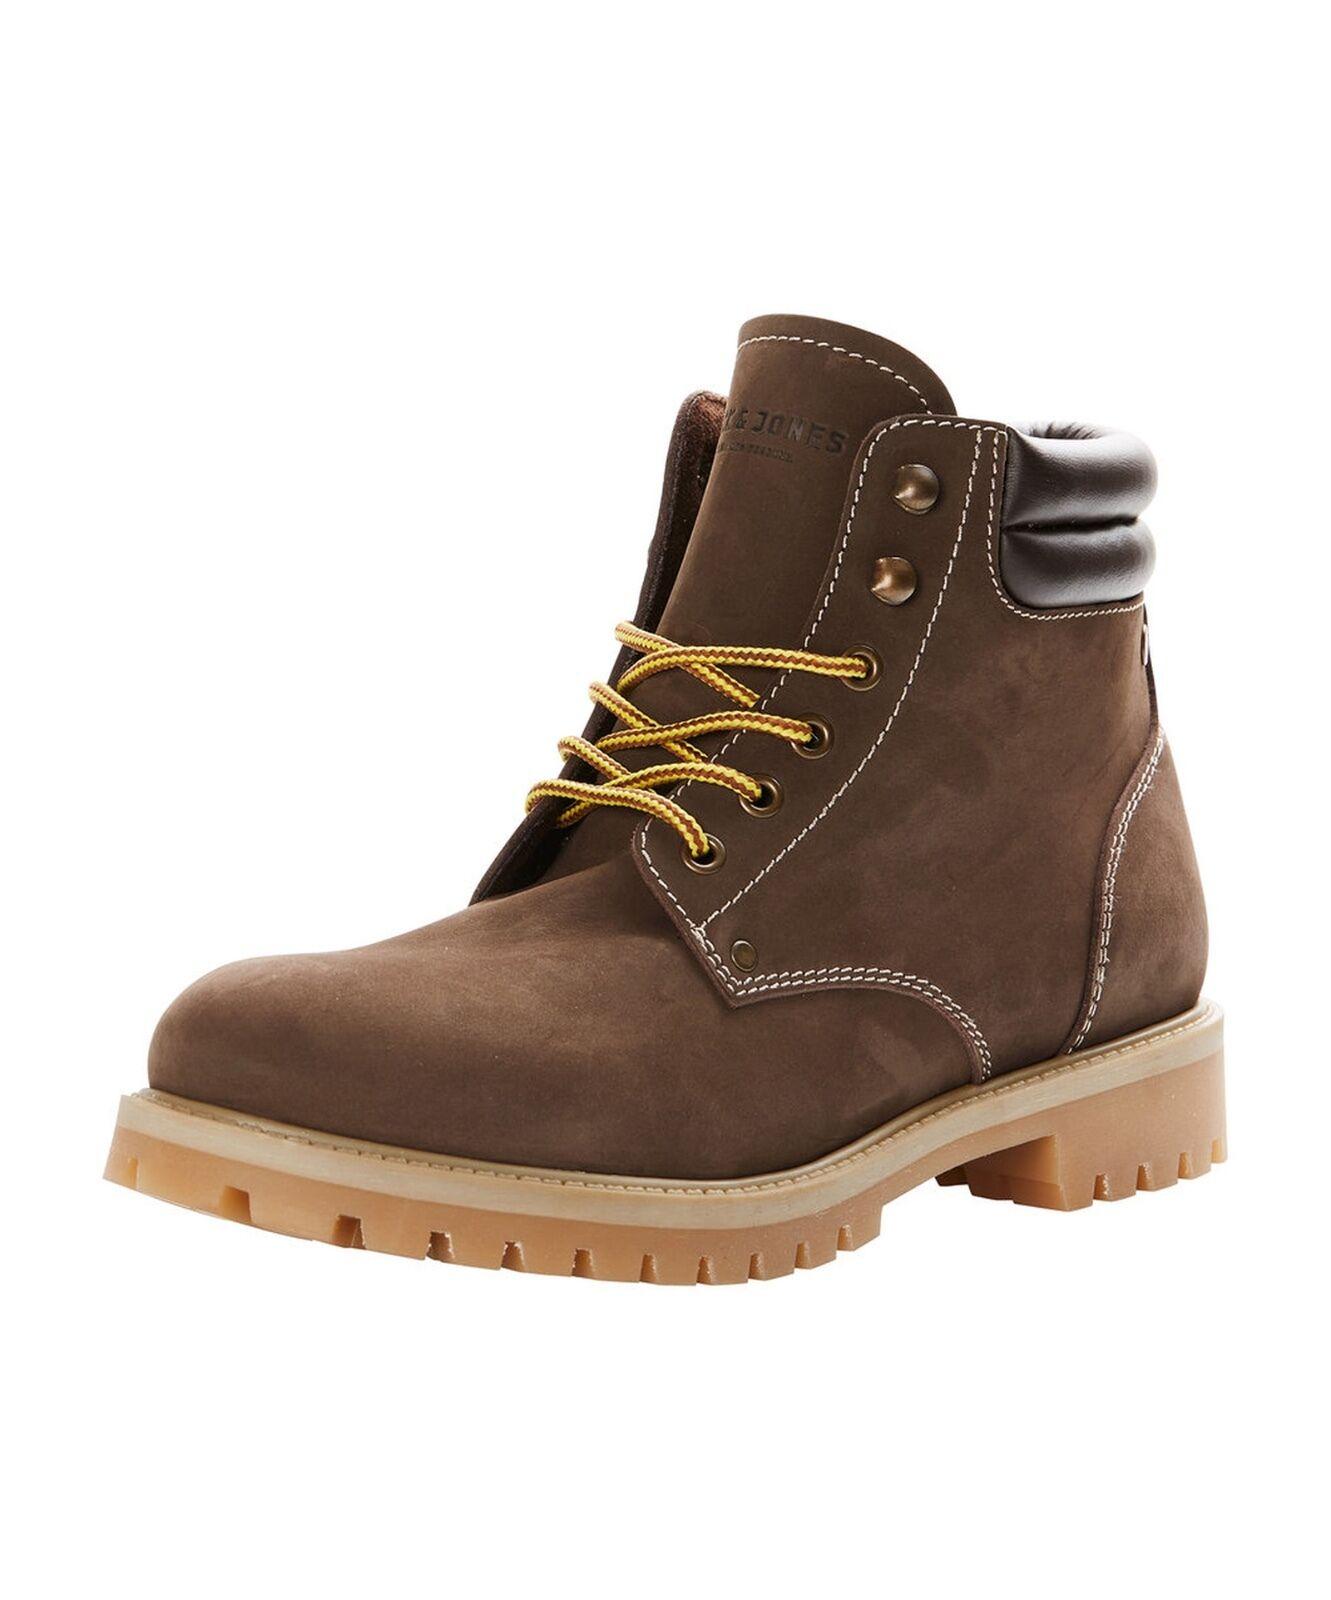 JACK & JONES Nubuck Stoke Leather botas High Top Zapatos Zapatos Zapatos Java Beige Biker botas 75a002